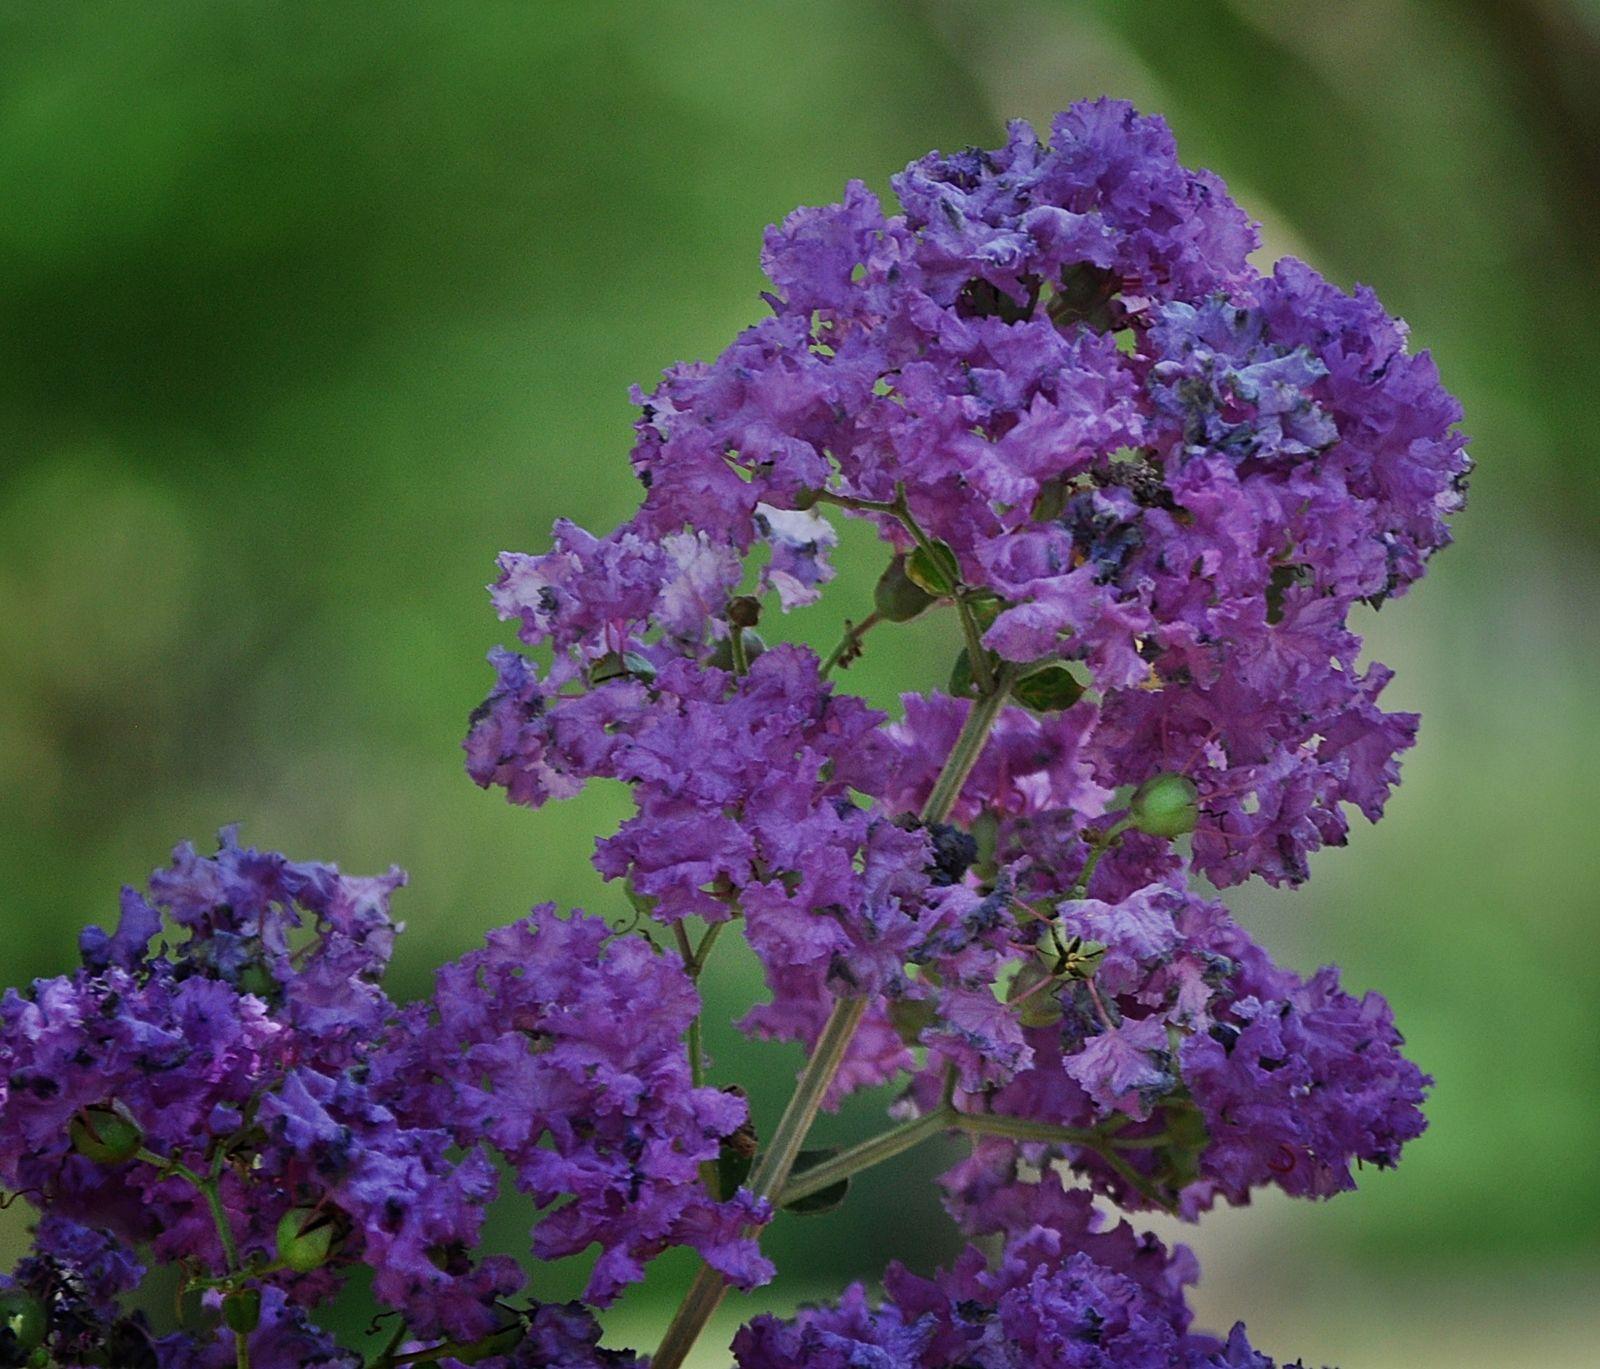 Purple Crape Myrtle Www.outdoorcreationslandscapes.com